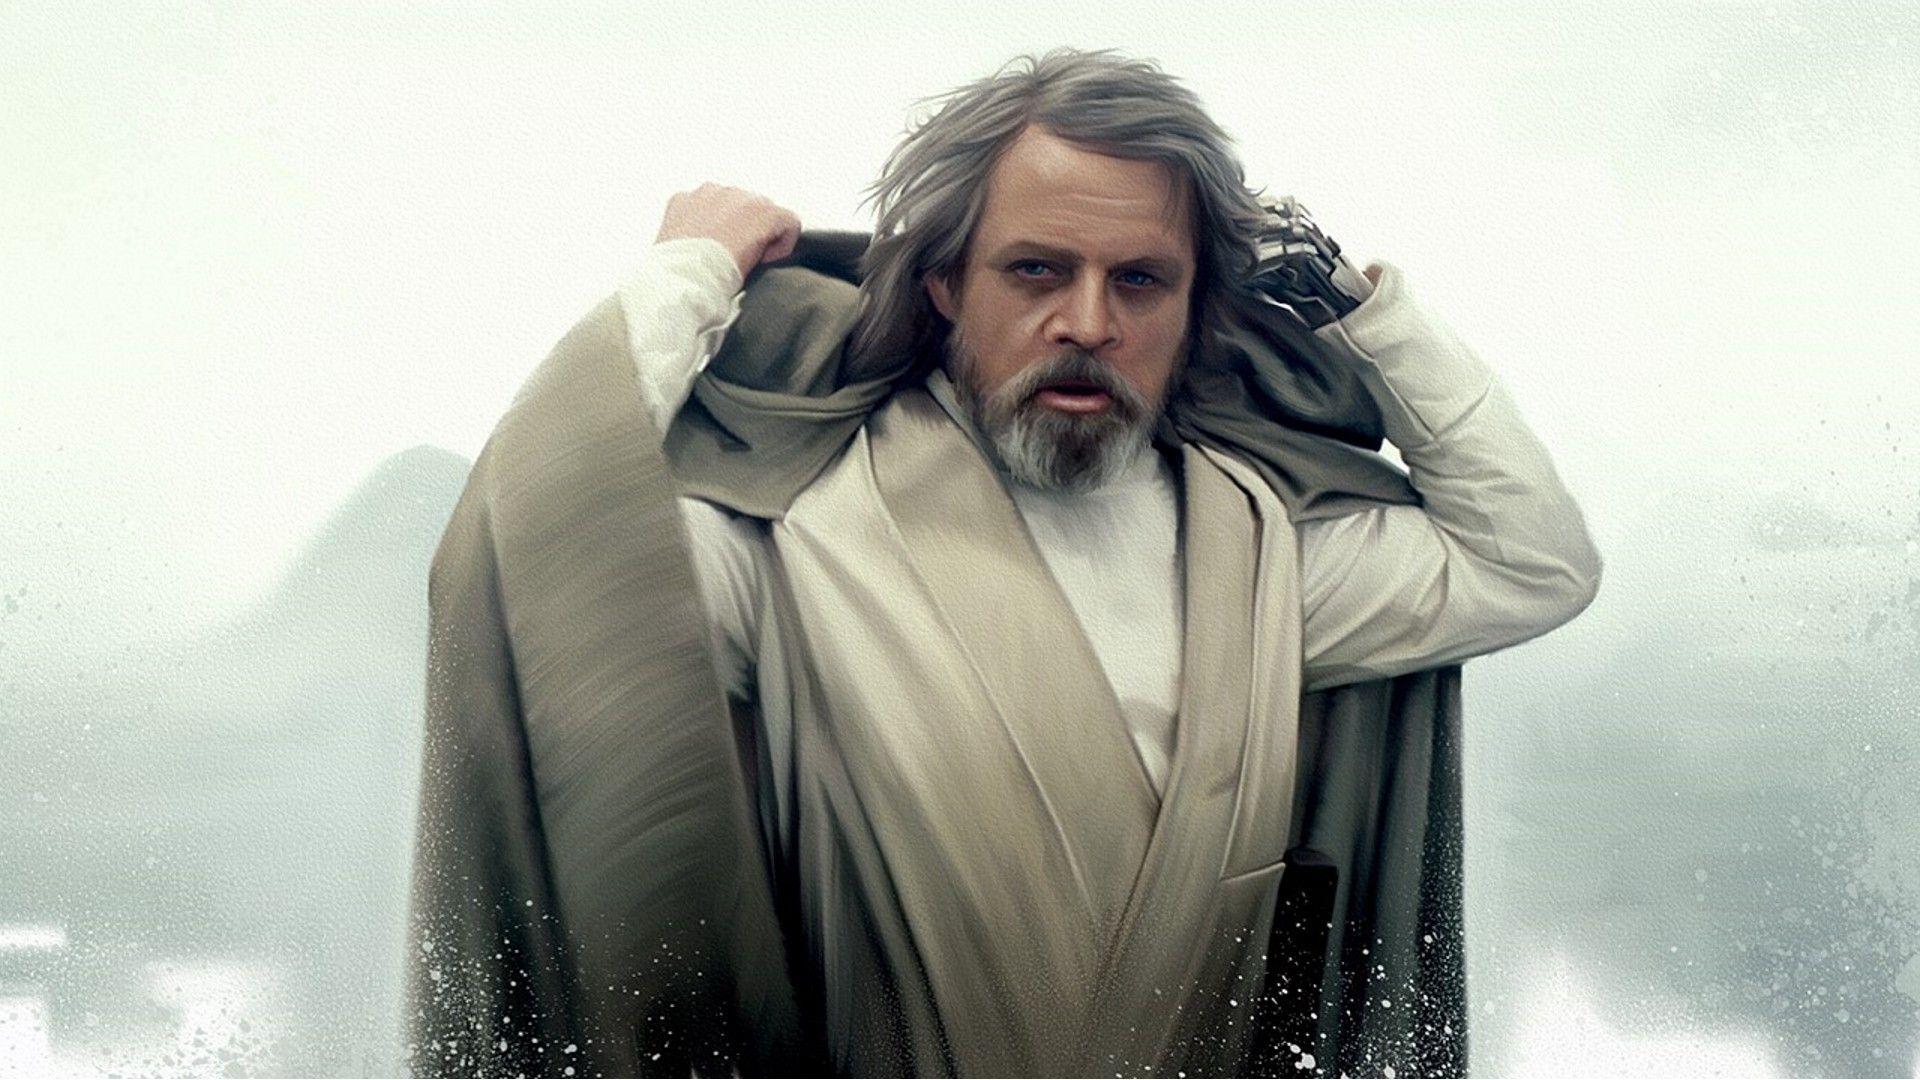 """Star Wars: Os Últimos Jedi"": final de Luke Skywalker decepciona fãs da saga"